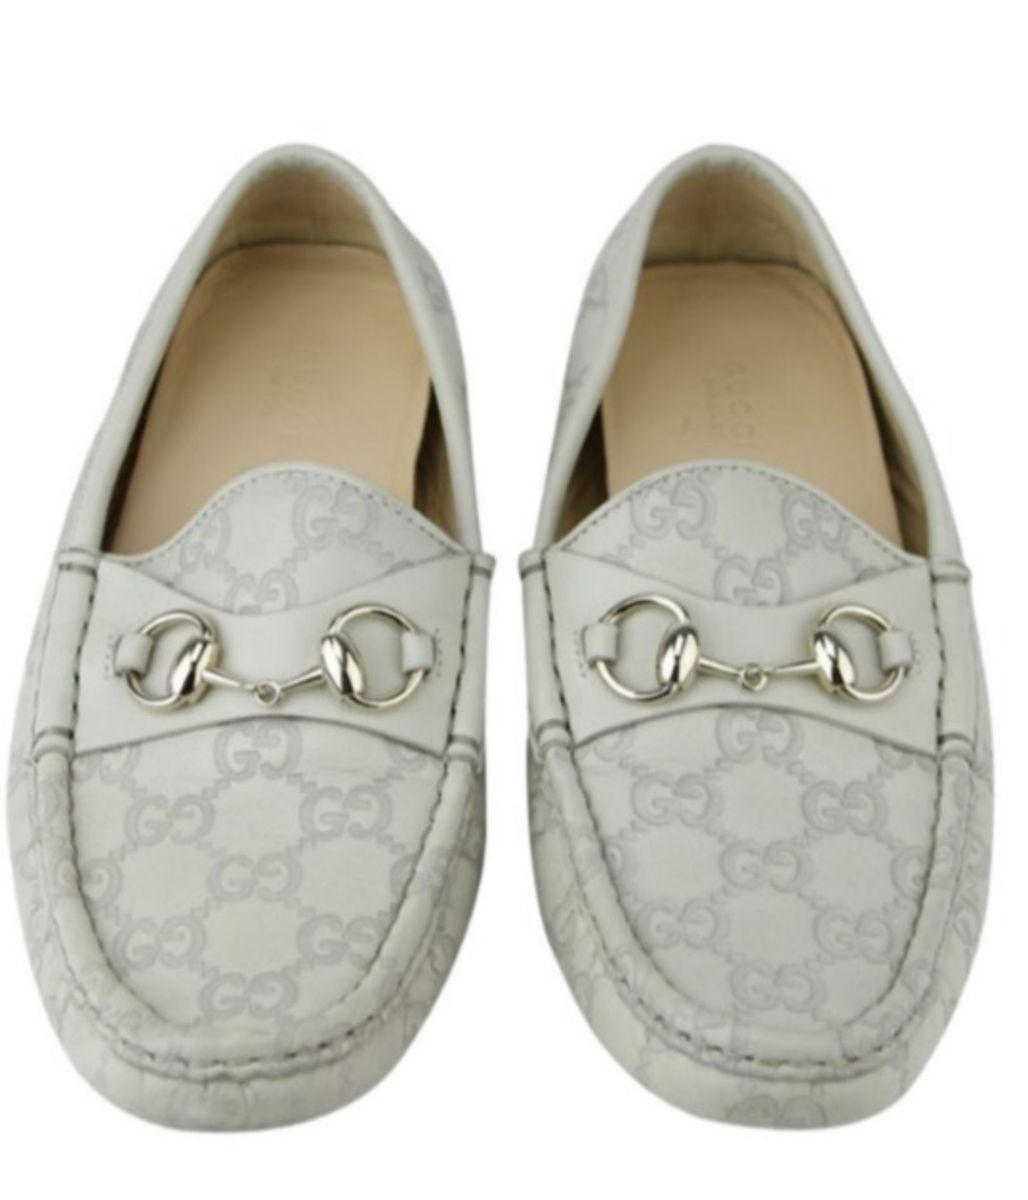 3a0d3e6f6 mocassim gucci - sapatos gucci.  Czm6ly9wag90b3muzw5qb2vplmnvbs5ici9wcm9kdwn0cy8xnjkyodkvywi1njuwmdc1mzvjmdy5mmi3nwrlzdc0yta4mdcwyzquanbn